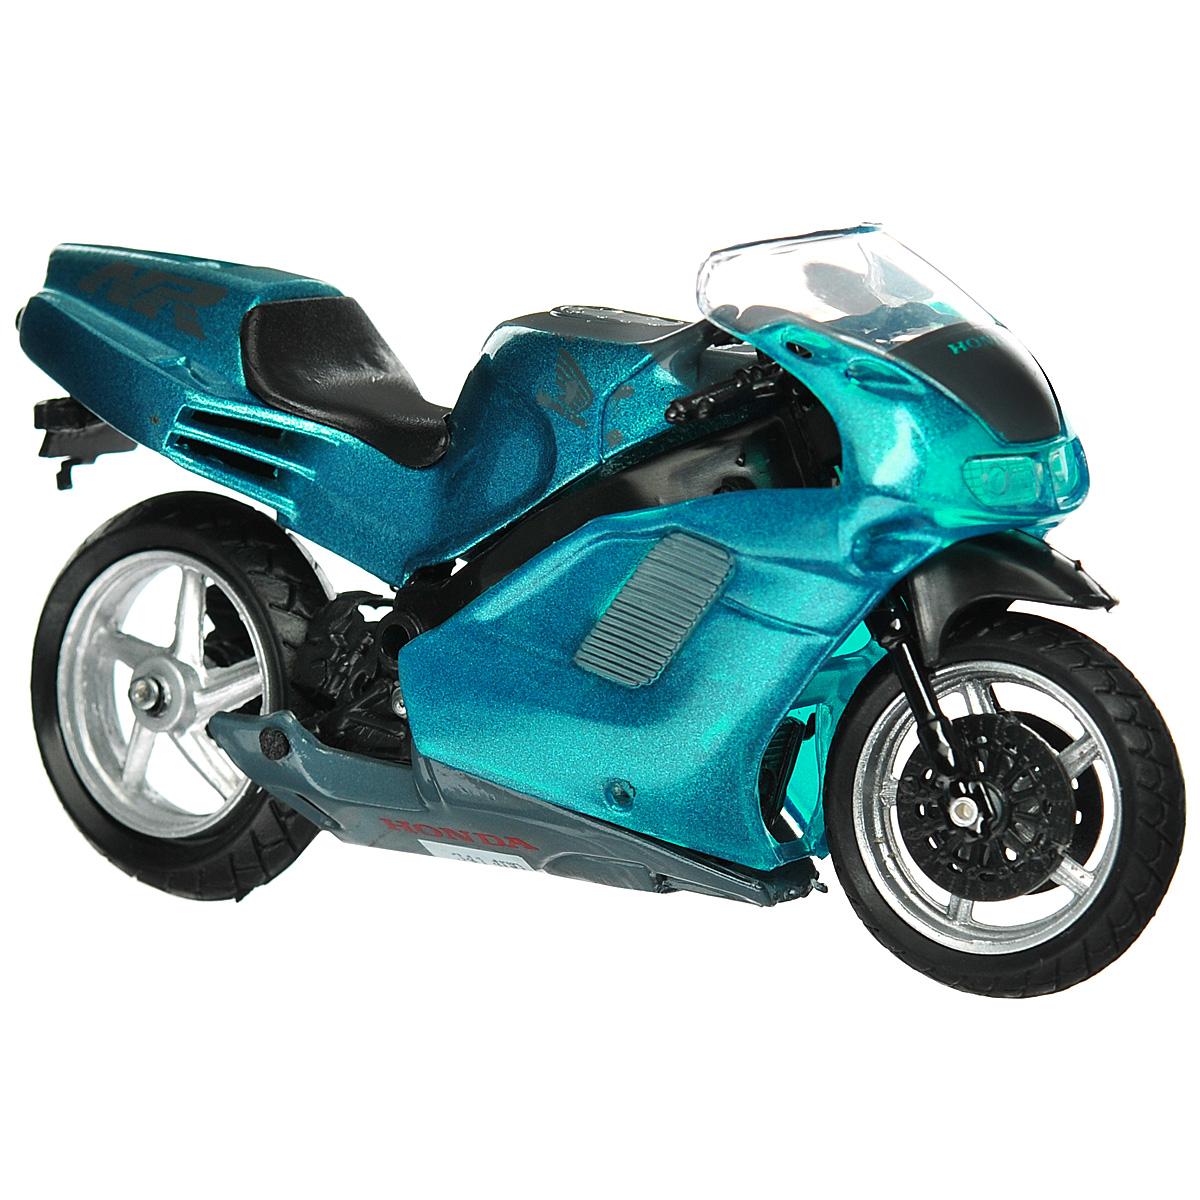 Autotime Коллекционная модель мотоцикла Honda NR, цвет: темно-бирюзовый. Масштаб 1/18 тюнинг мотоцикла cqr t4